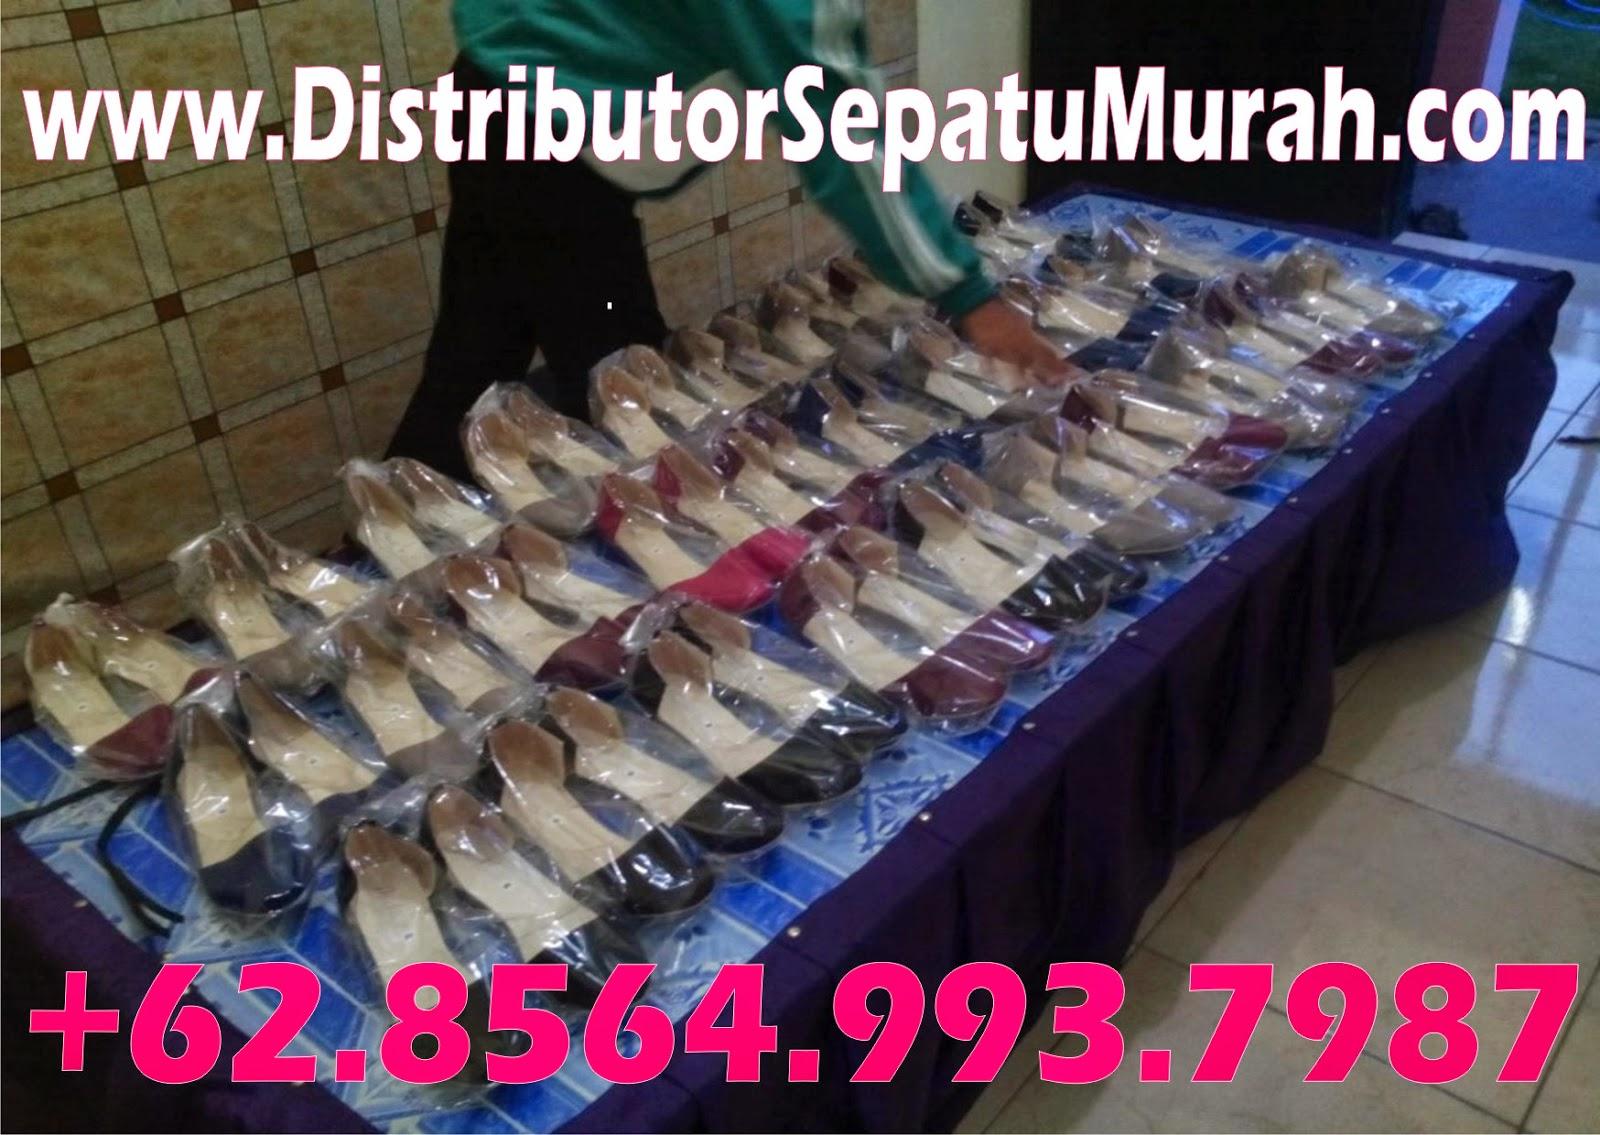 Sepatu High Heels, Sepatu Heels Wanita, Sepatu Heels, www.distributorsepatumurah.com